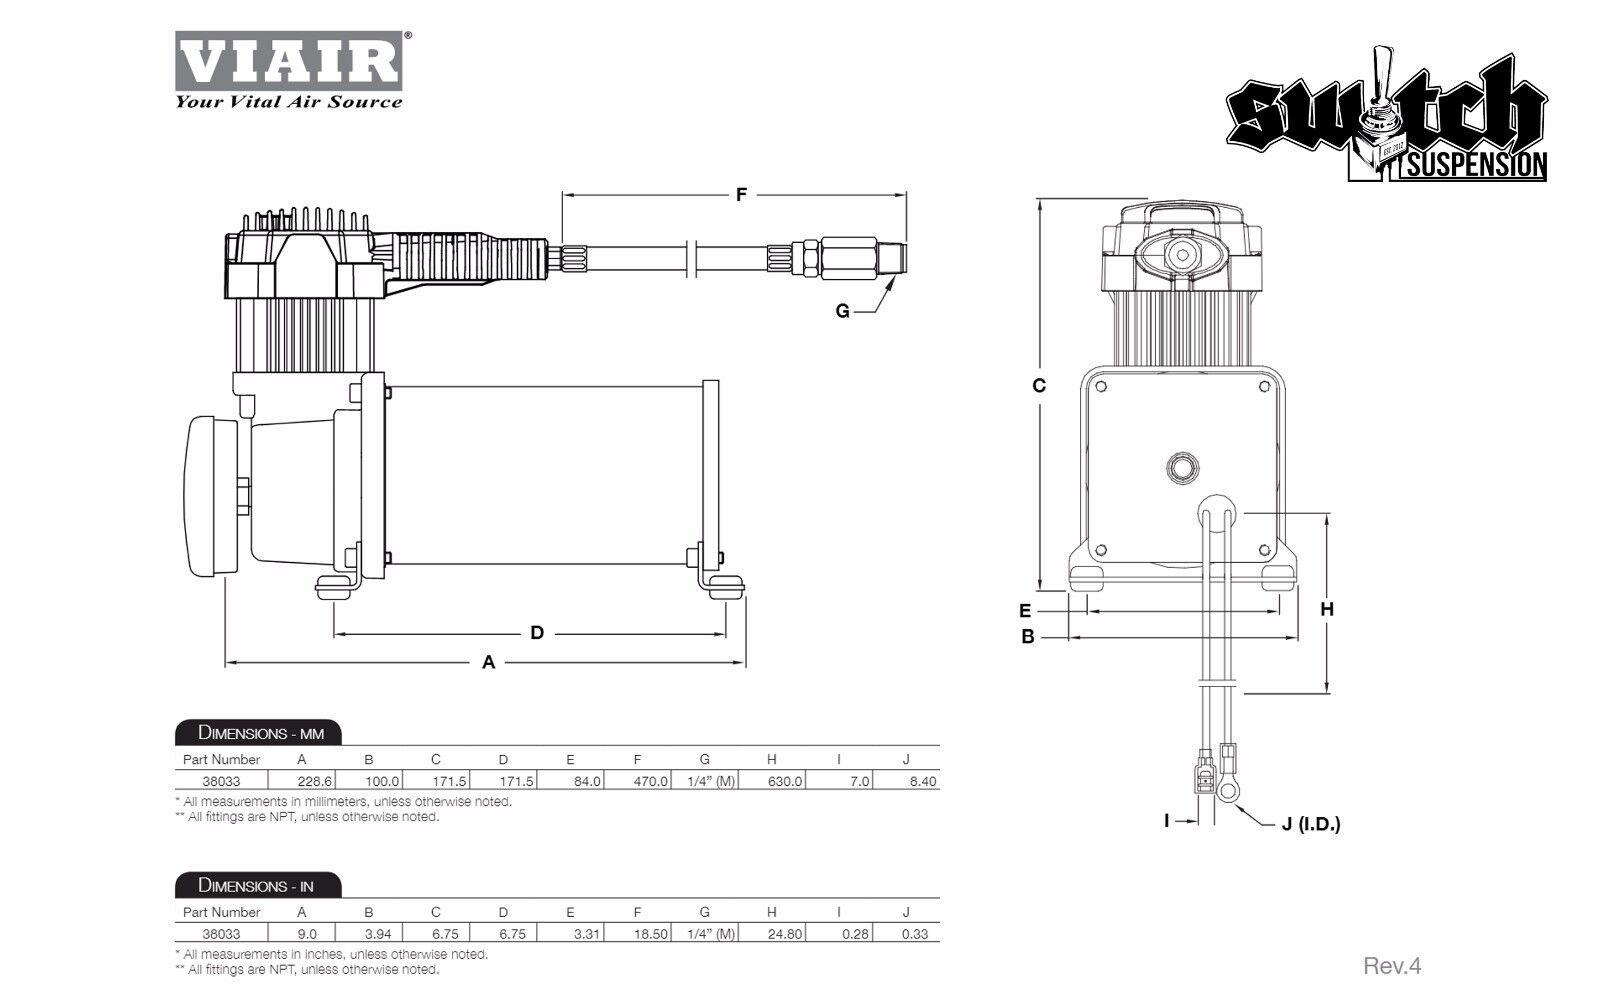 Suspension Diagram On Viair 12 Volt Air Compressor Wiring Diagram